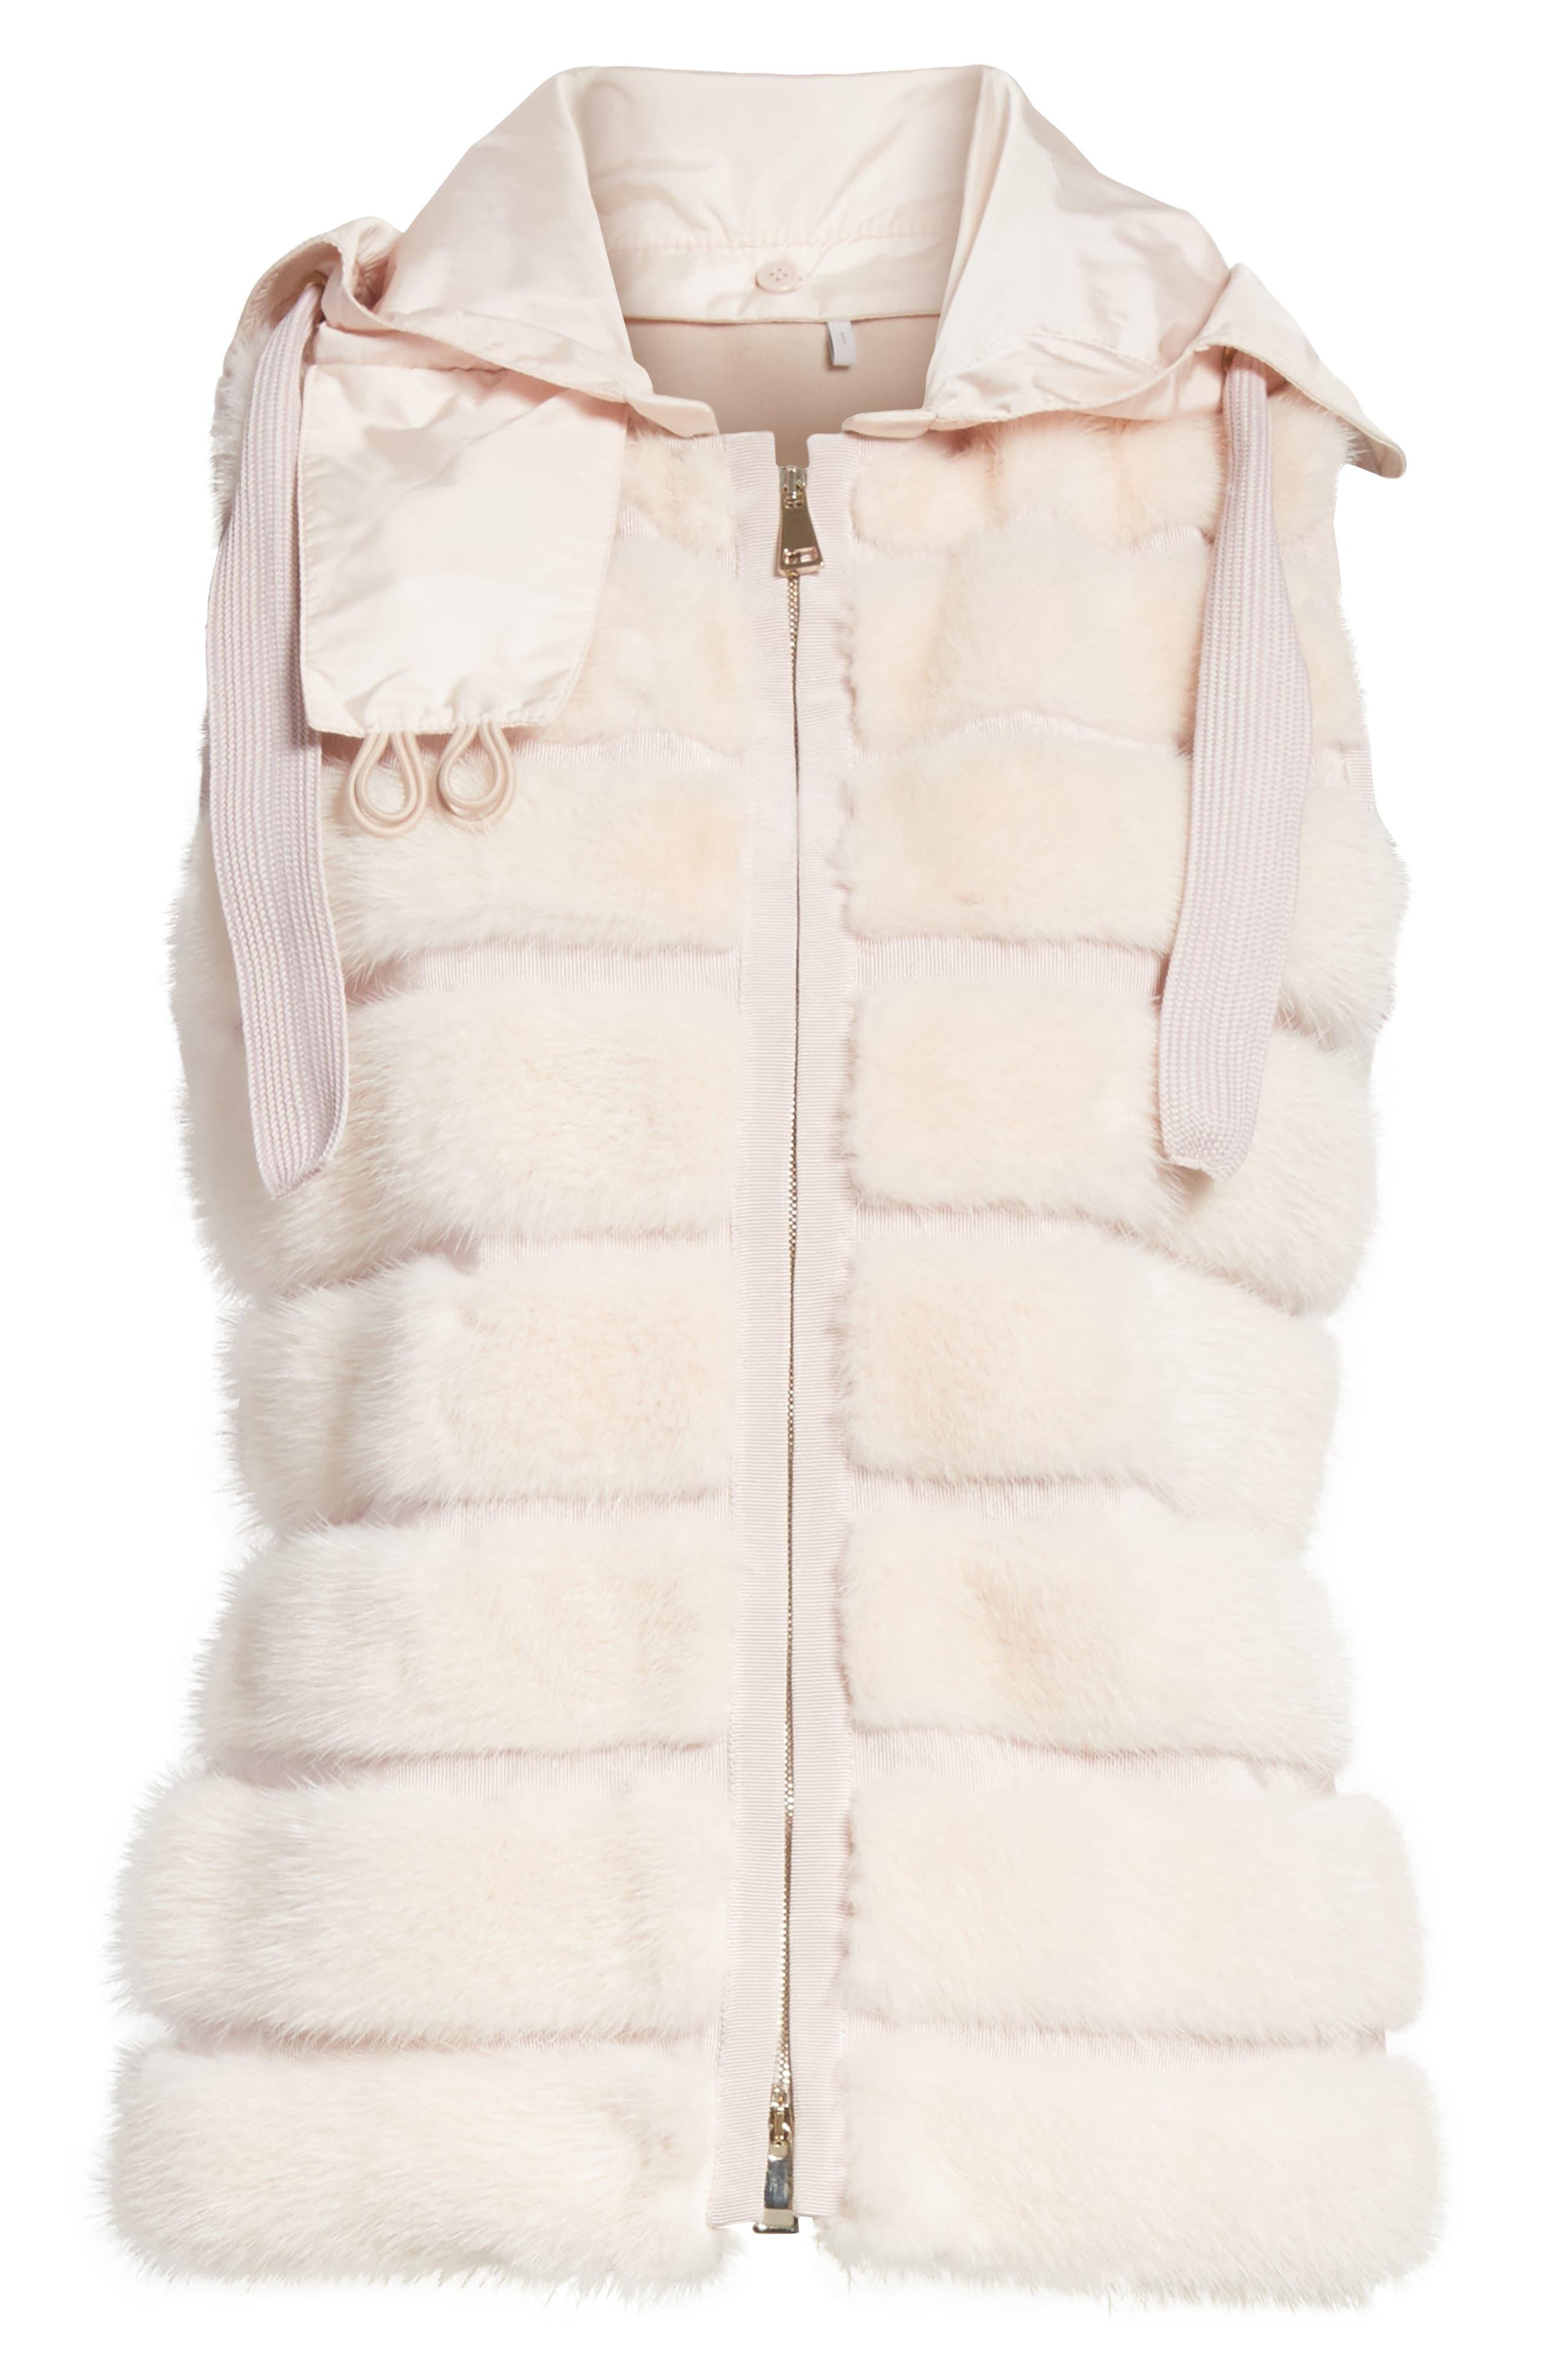 Ametrine Wool & Cashmere Vest with Genuine Mink Fur Trim & Removable Hood,                             Alternate thumbnail 7, color,                             Blush